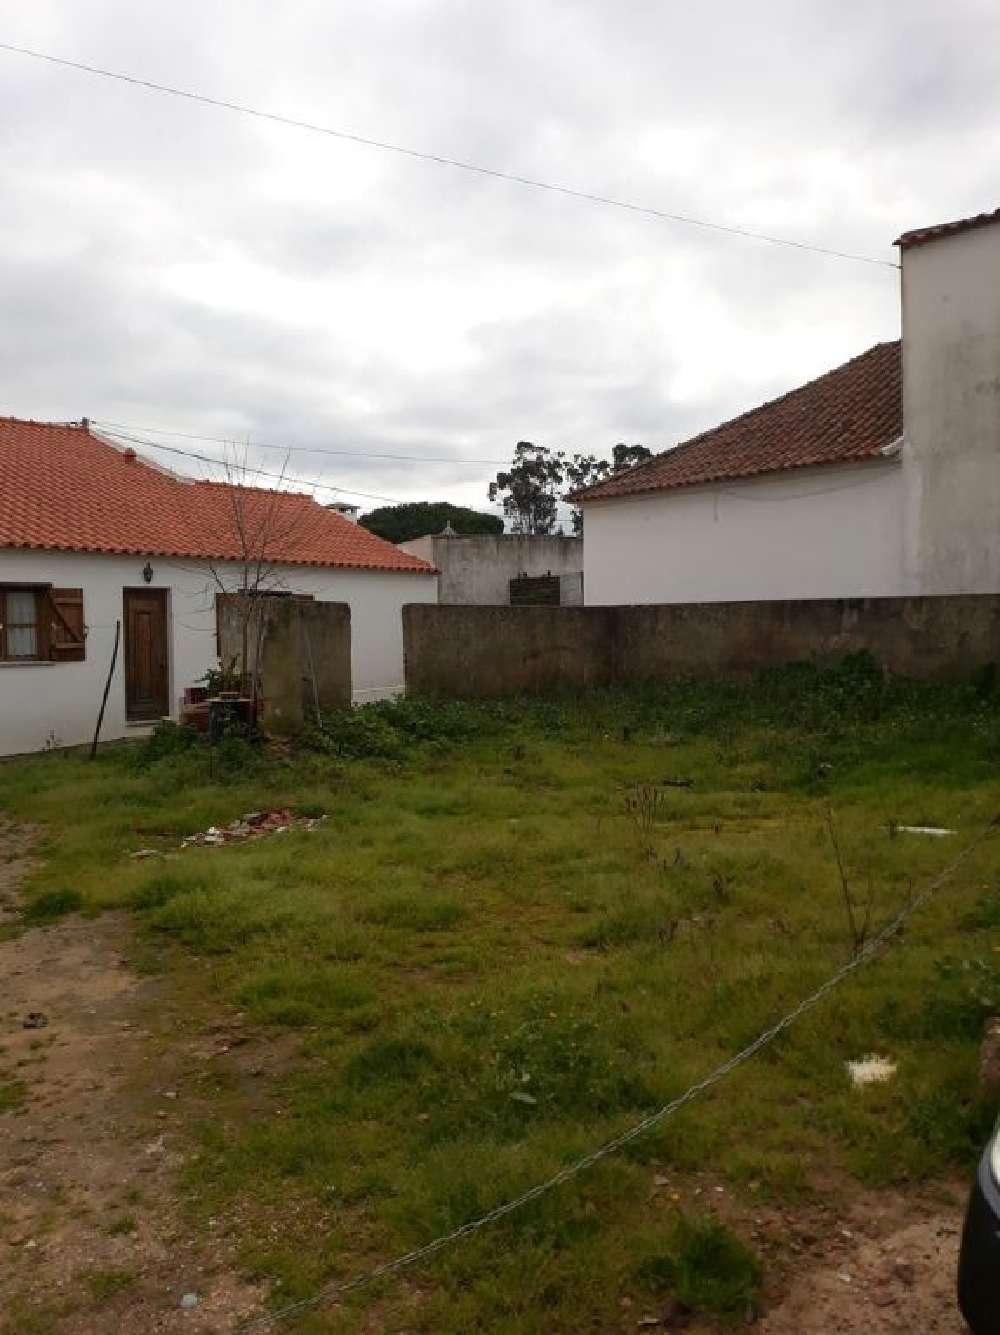 Ramalhal Torres Vedras terrain picture 171783